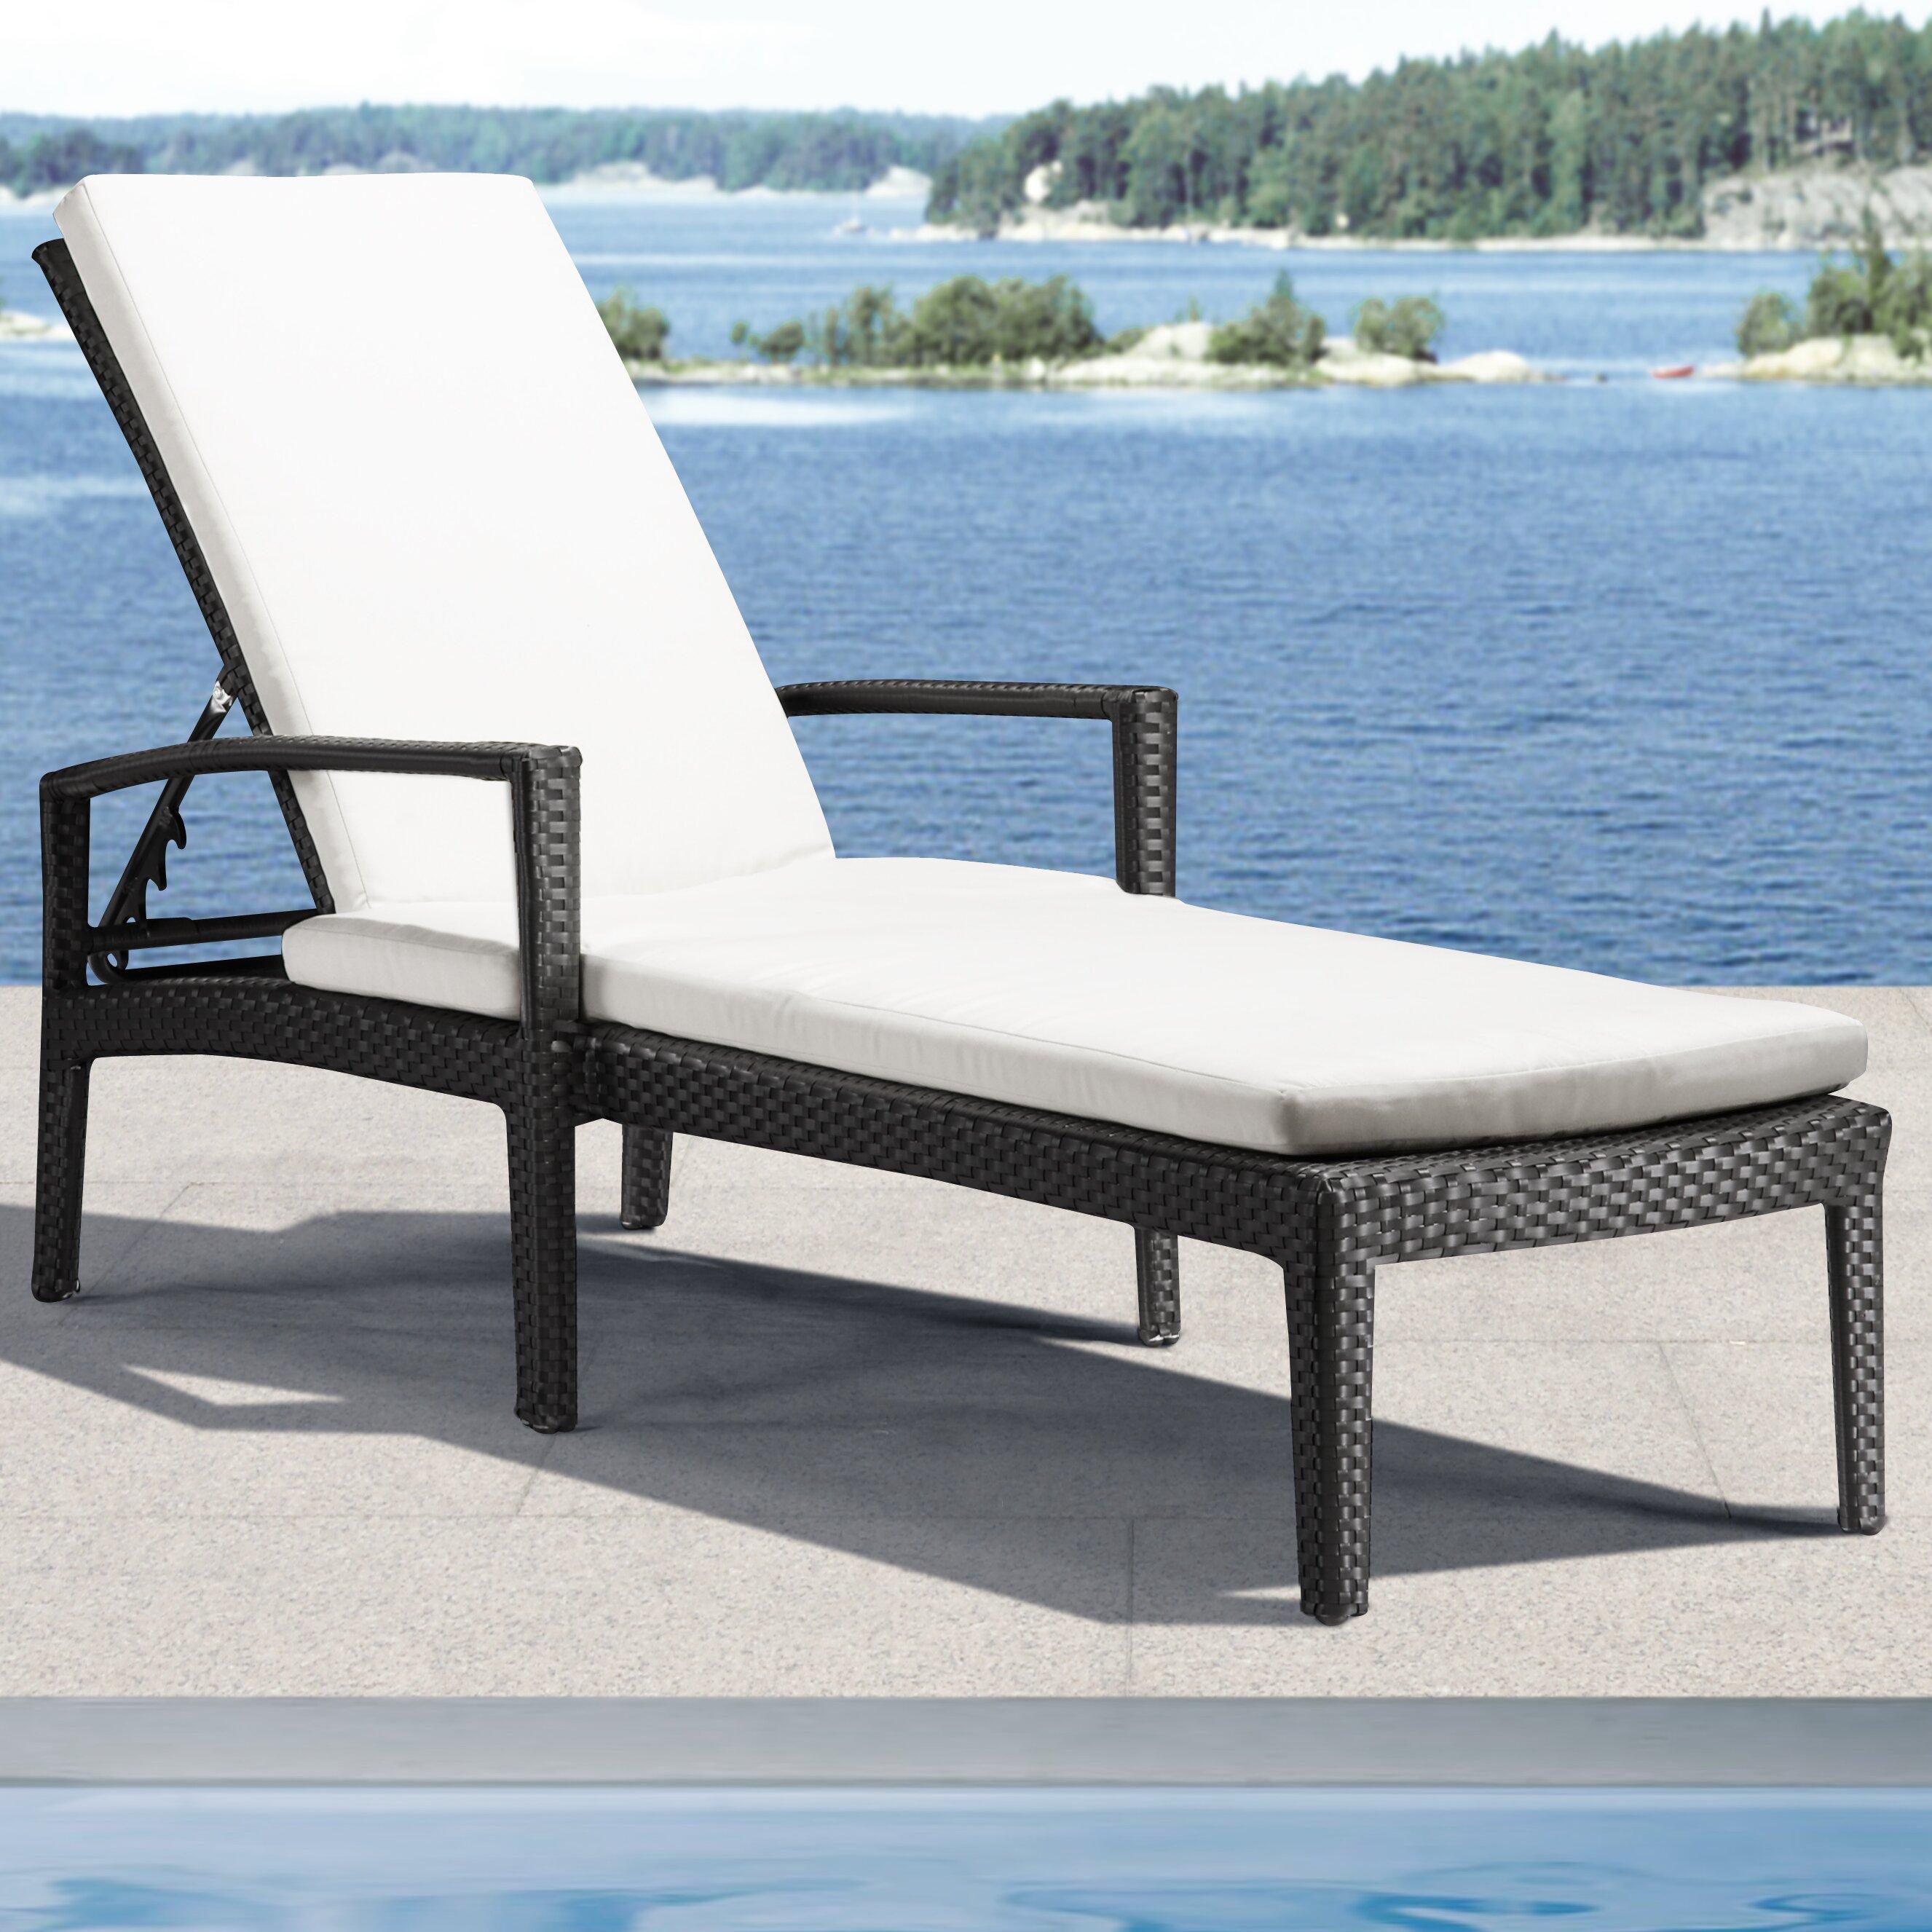 Dcor design phuket chaise lounge for Outdoor furniture phuket